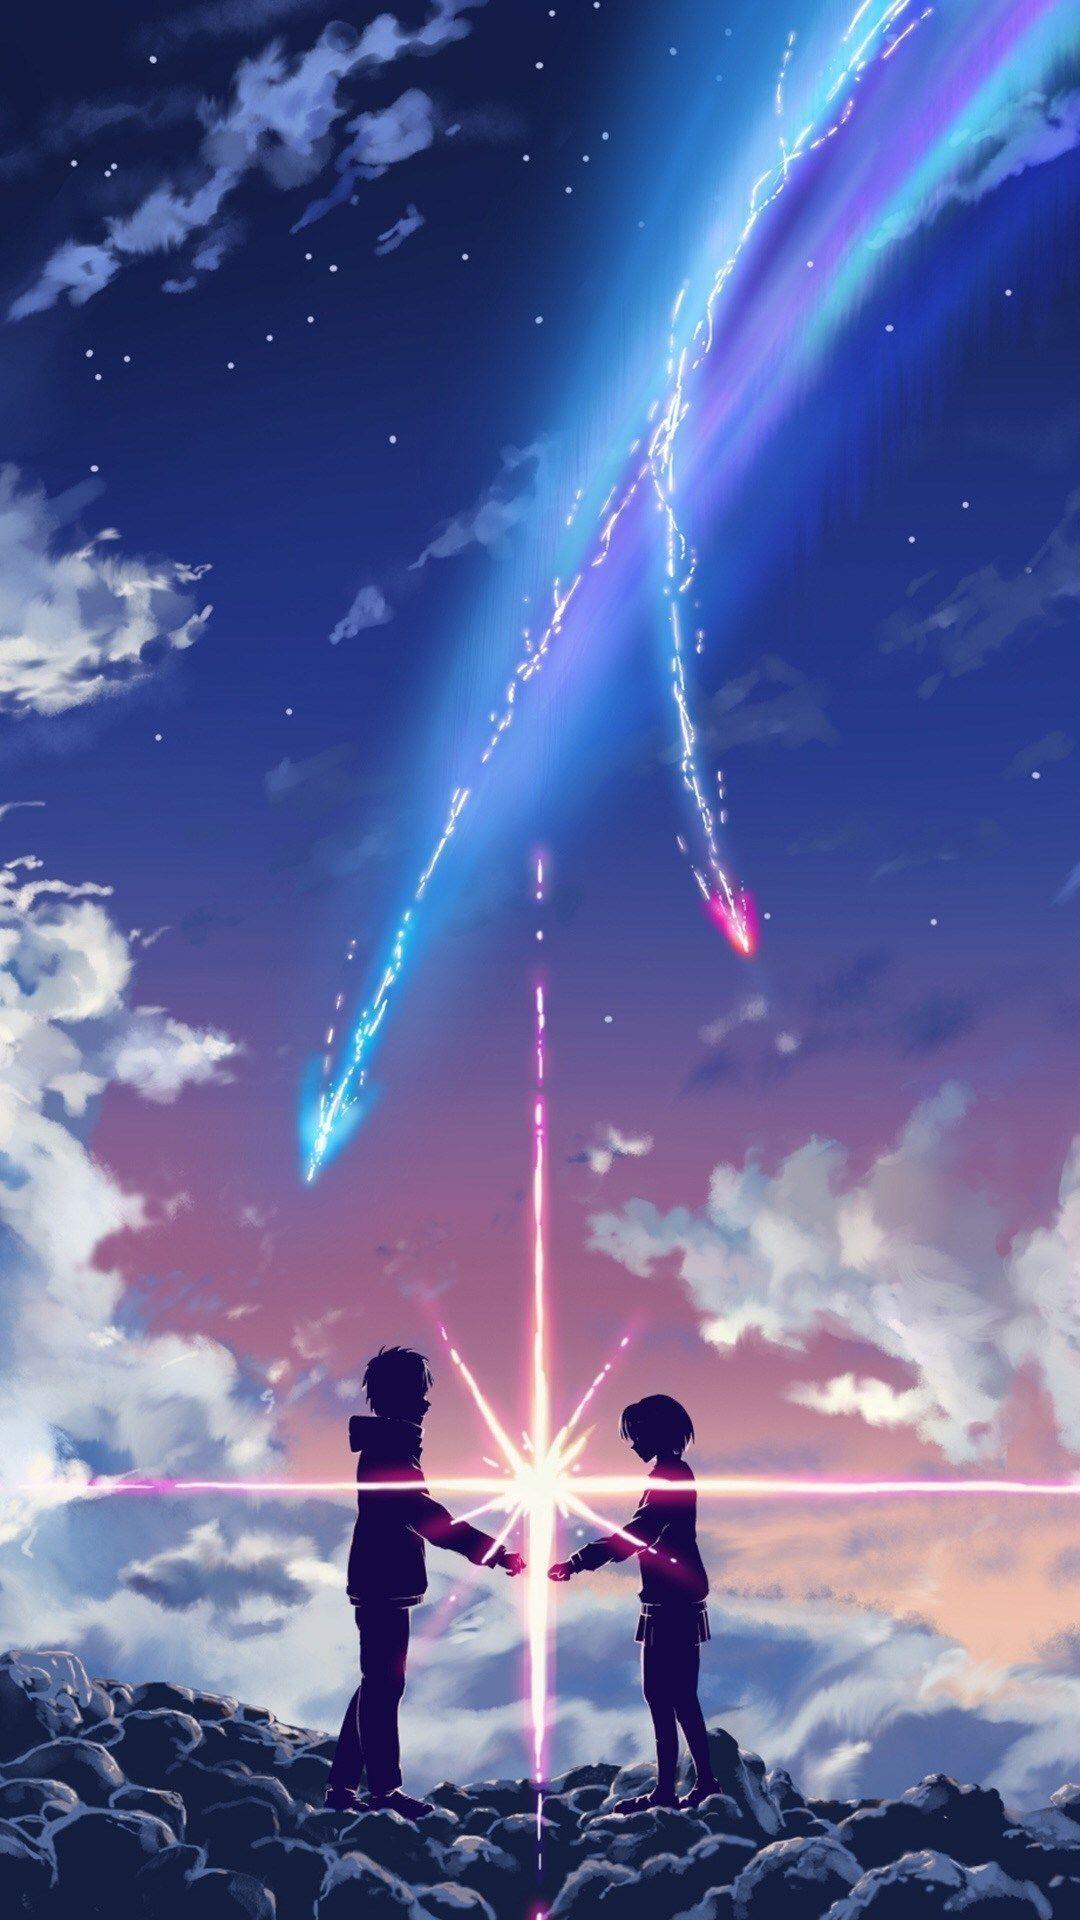 Aesthetic Anime Phone Wallpapers   Top Aesthetic Anime Phone 1080x1920